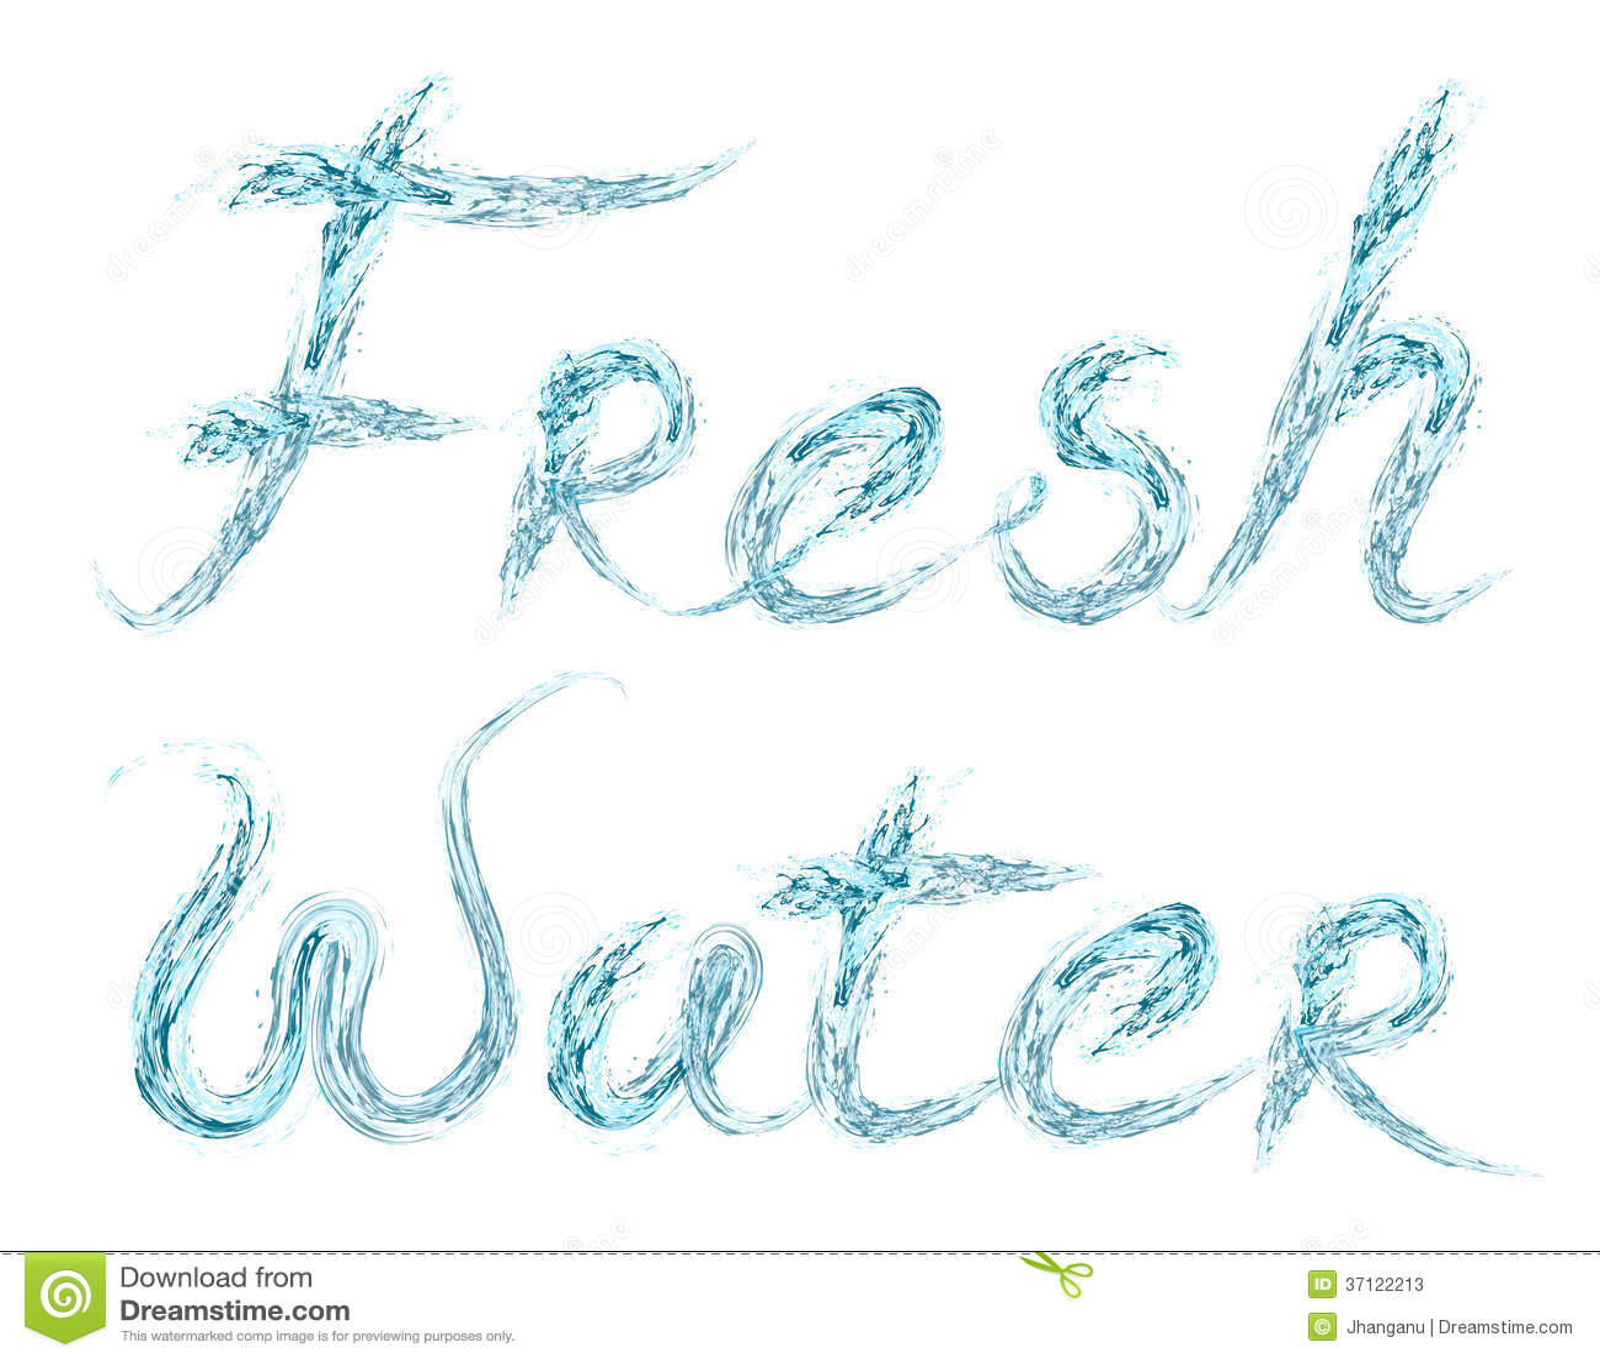 Fresh Water word on white